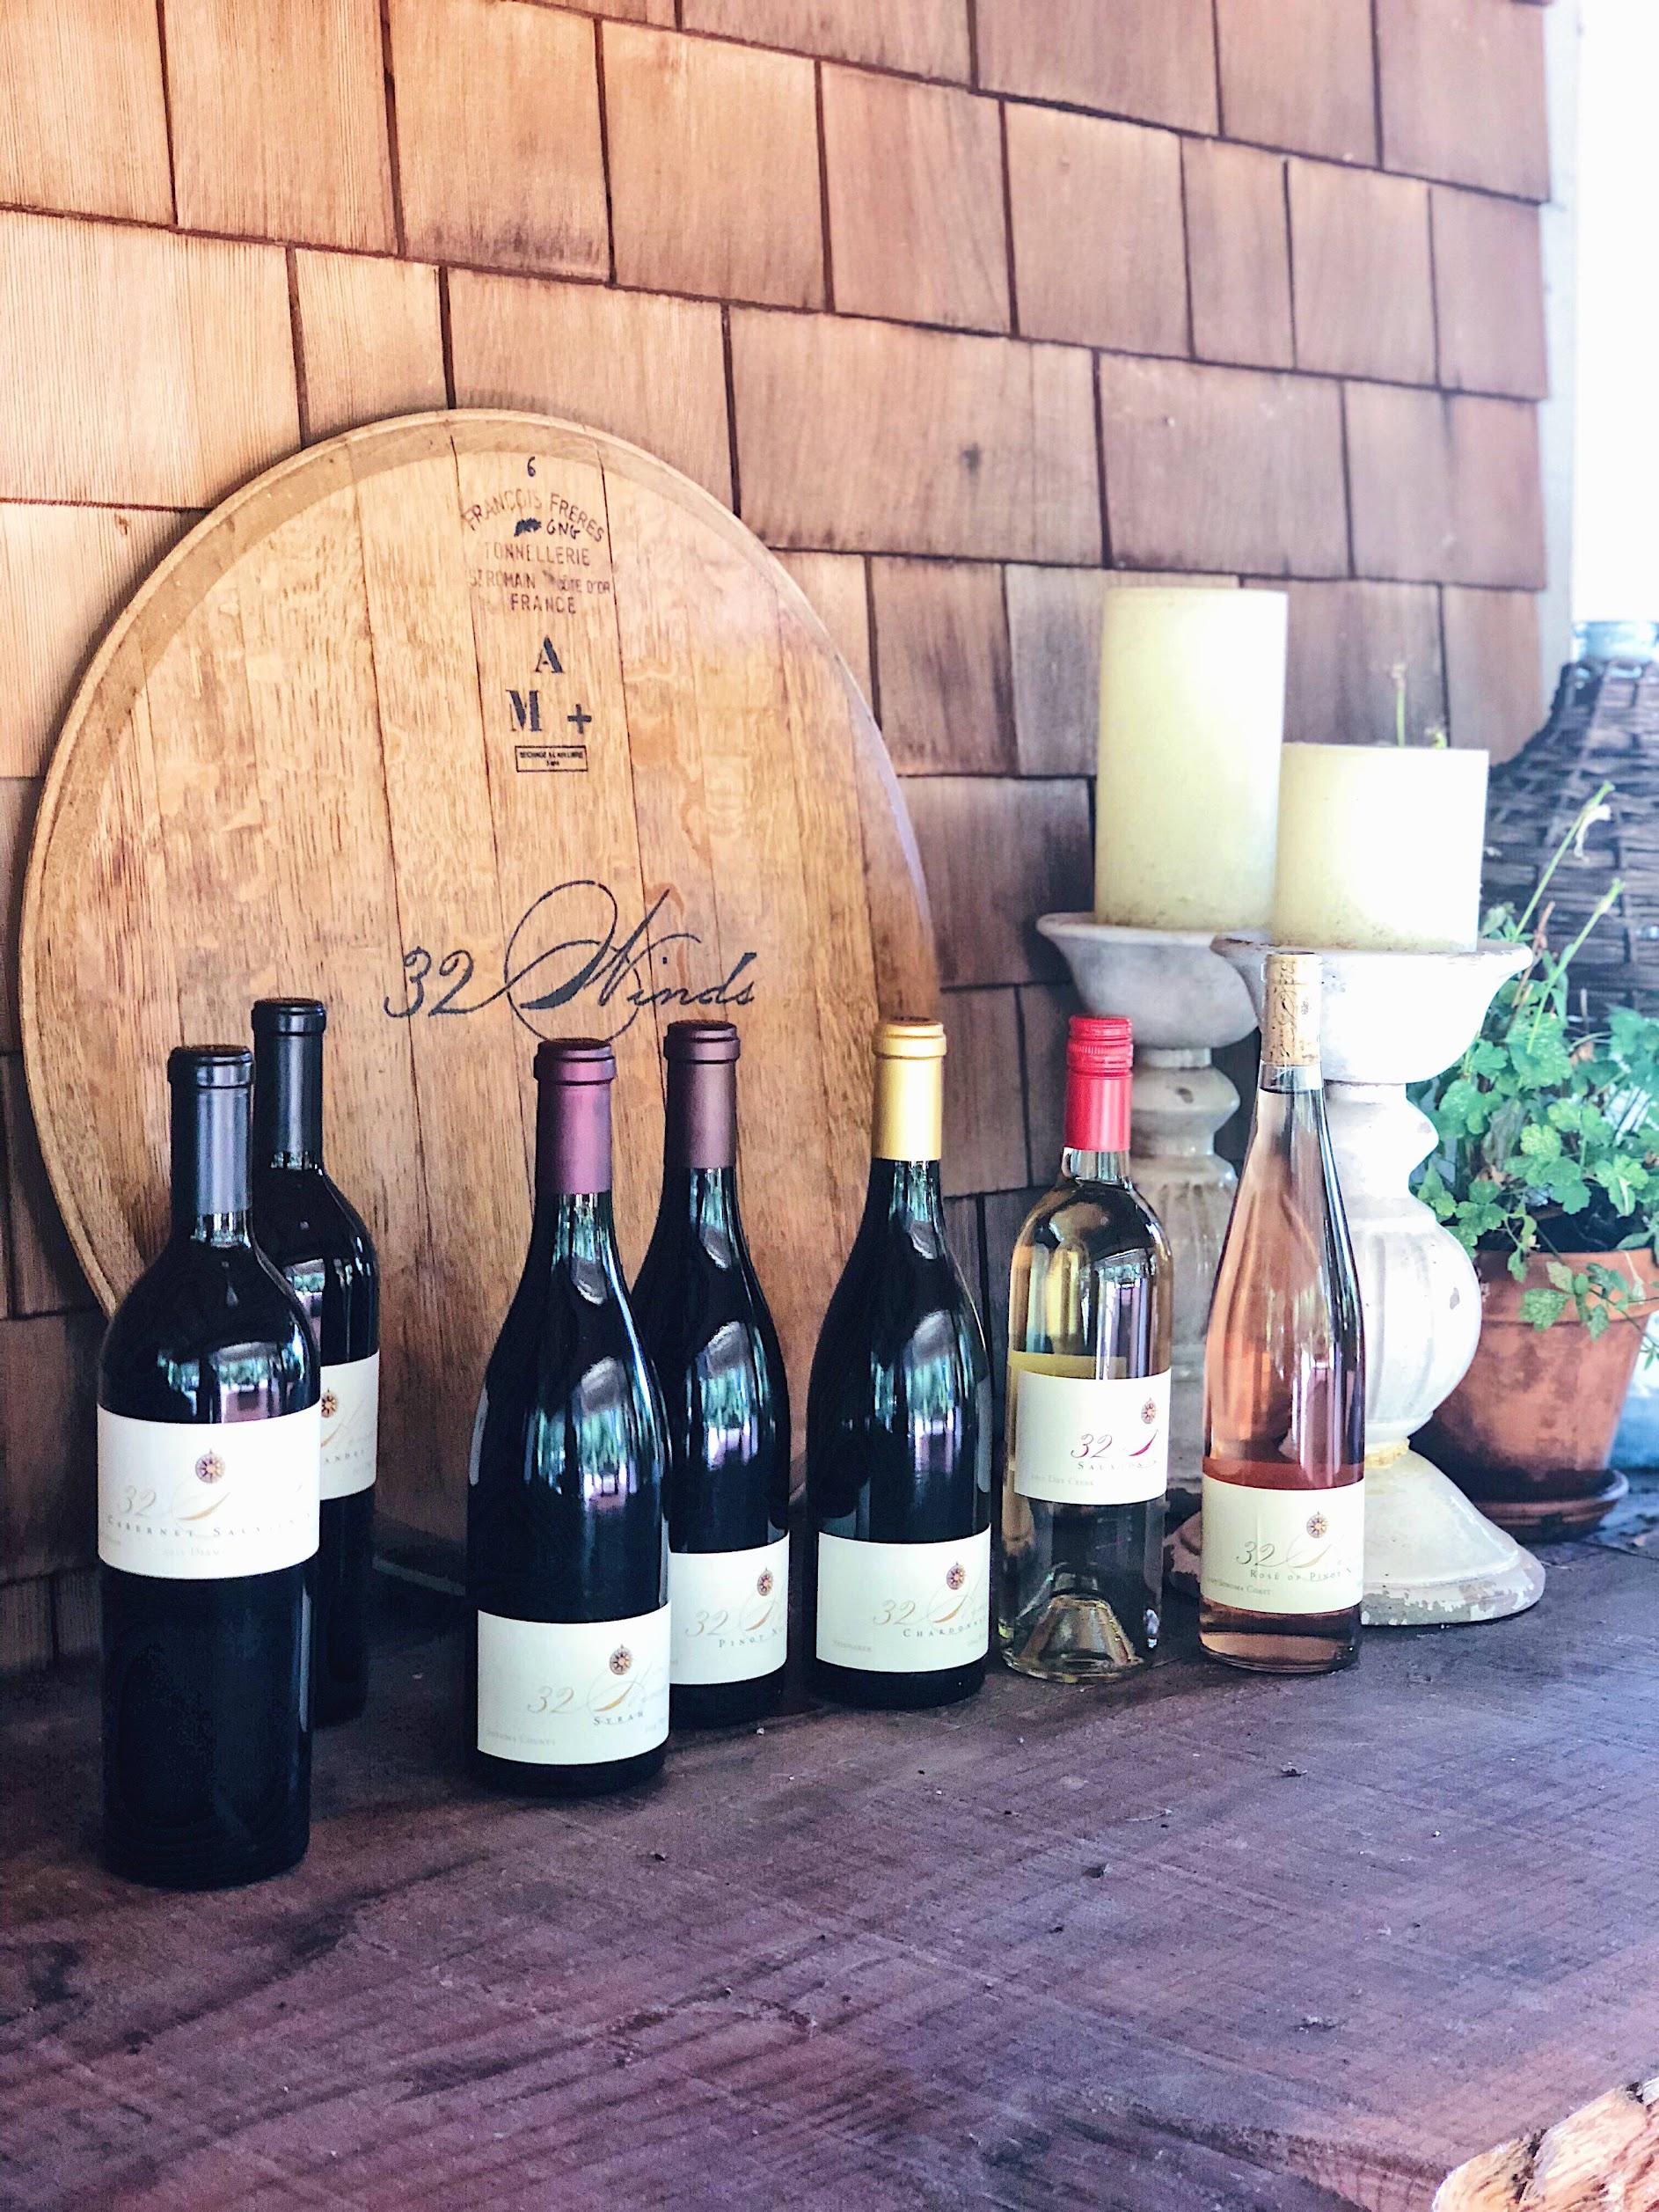 32 Winds Cabernet, Syrah, Pinot, Chardonnay, Rosé